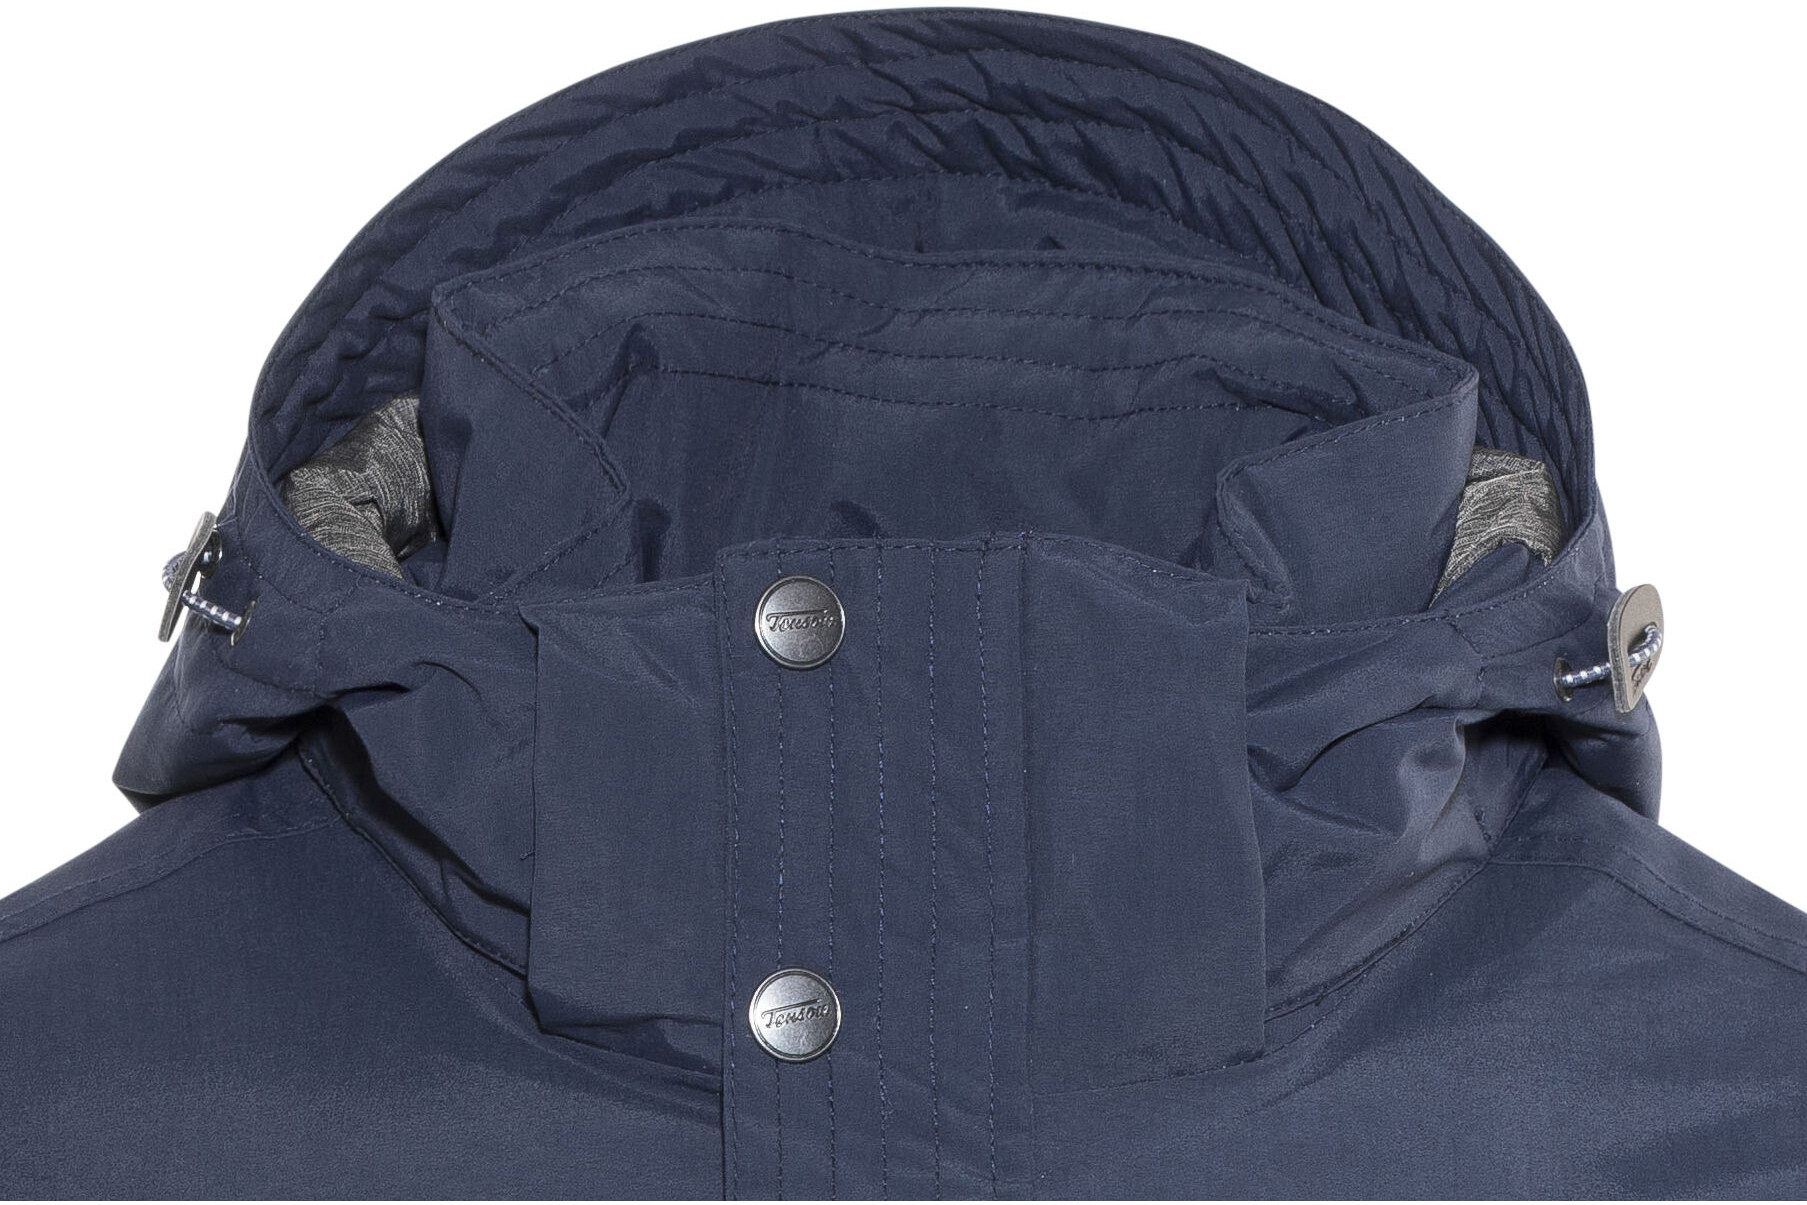 8b42be9092ed82 Tenson Lonan Jas, dark blue l Online outdoor shop Campz.nl